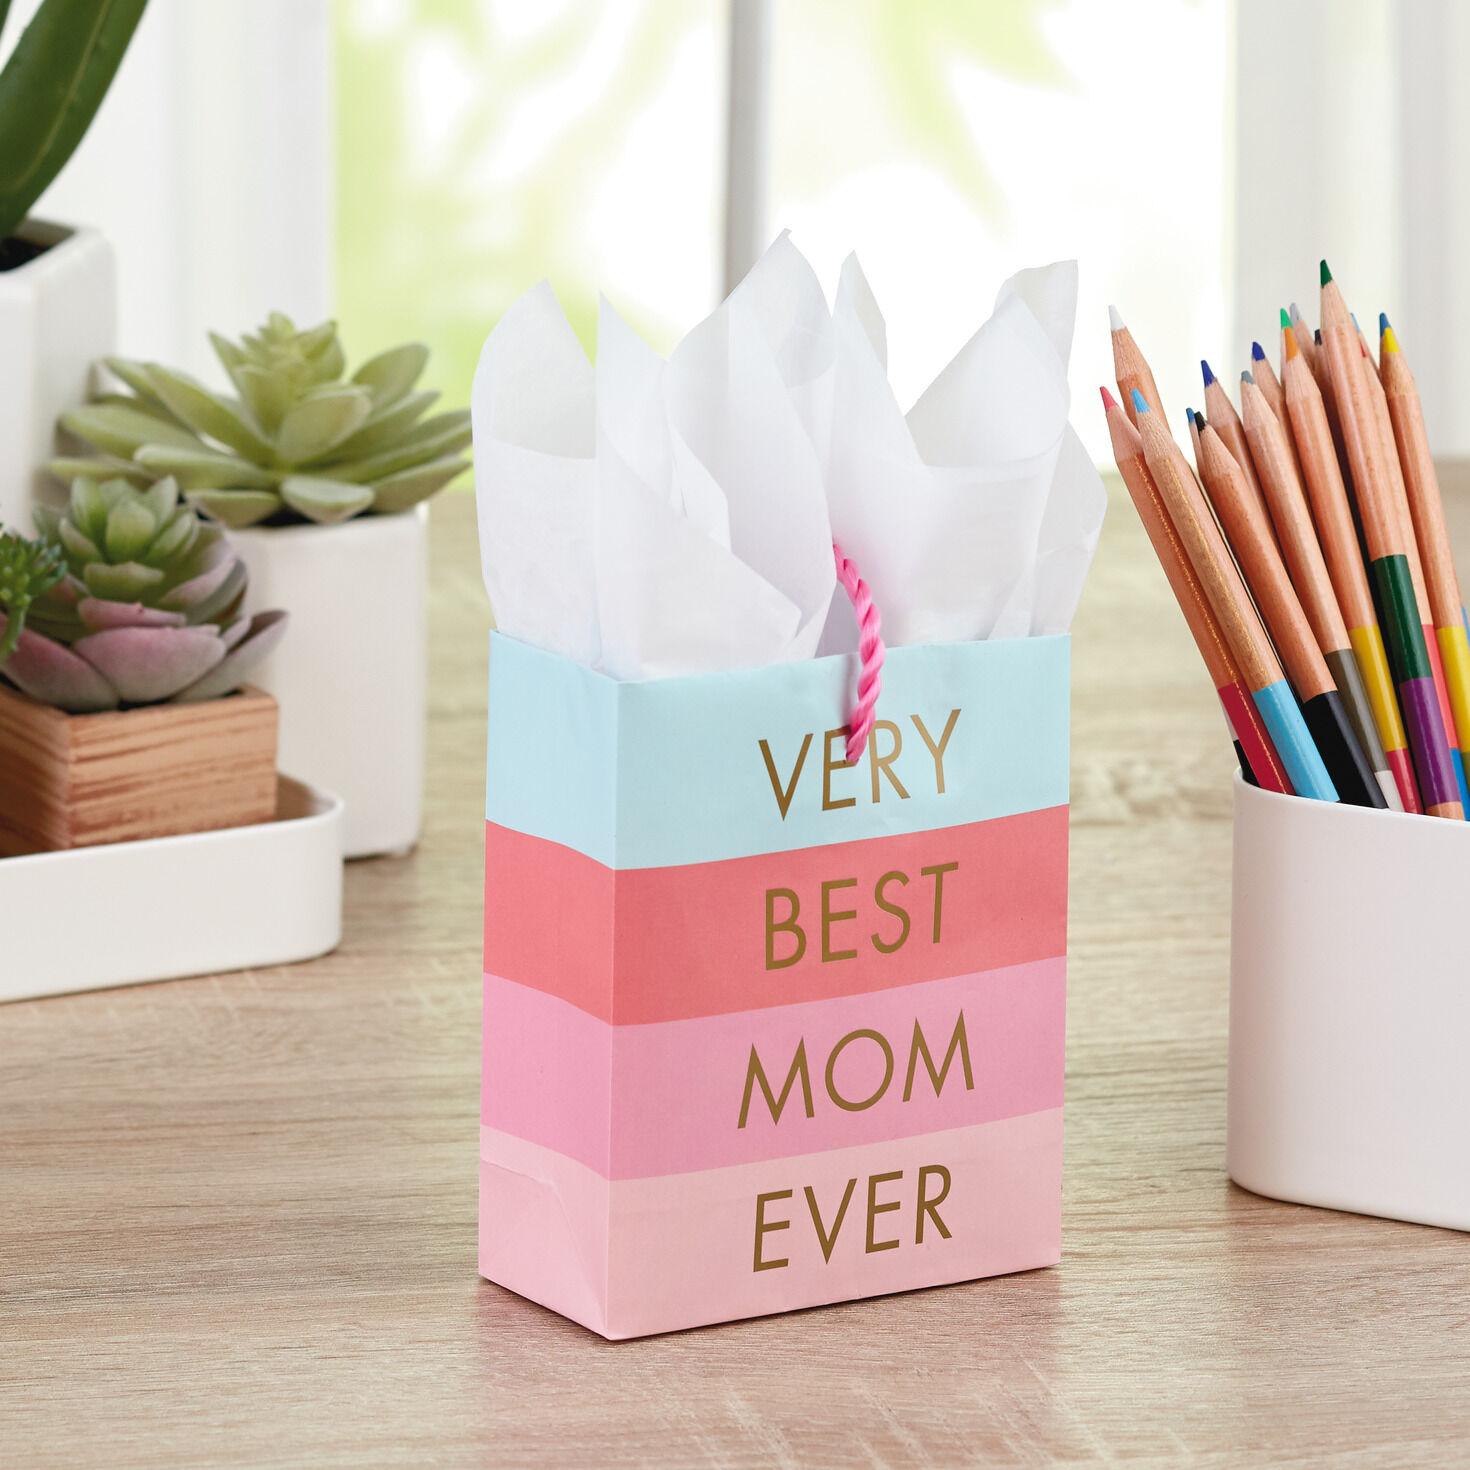 Teacher Gift Card Holders Pack of 5 CHOOSE DESIGN NEW BRAND NEW PACKAGE